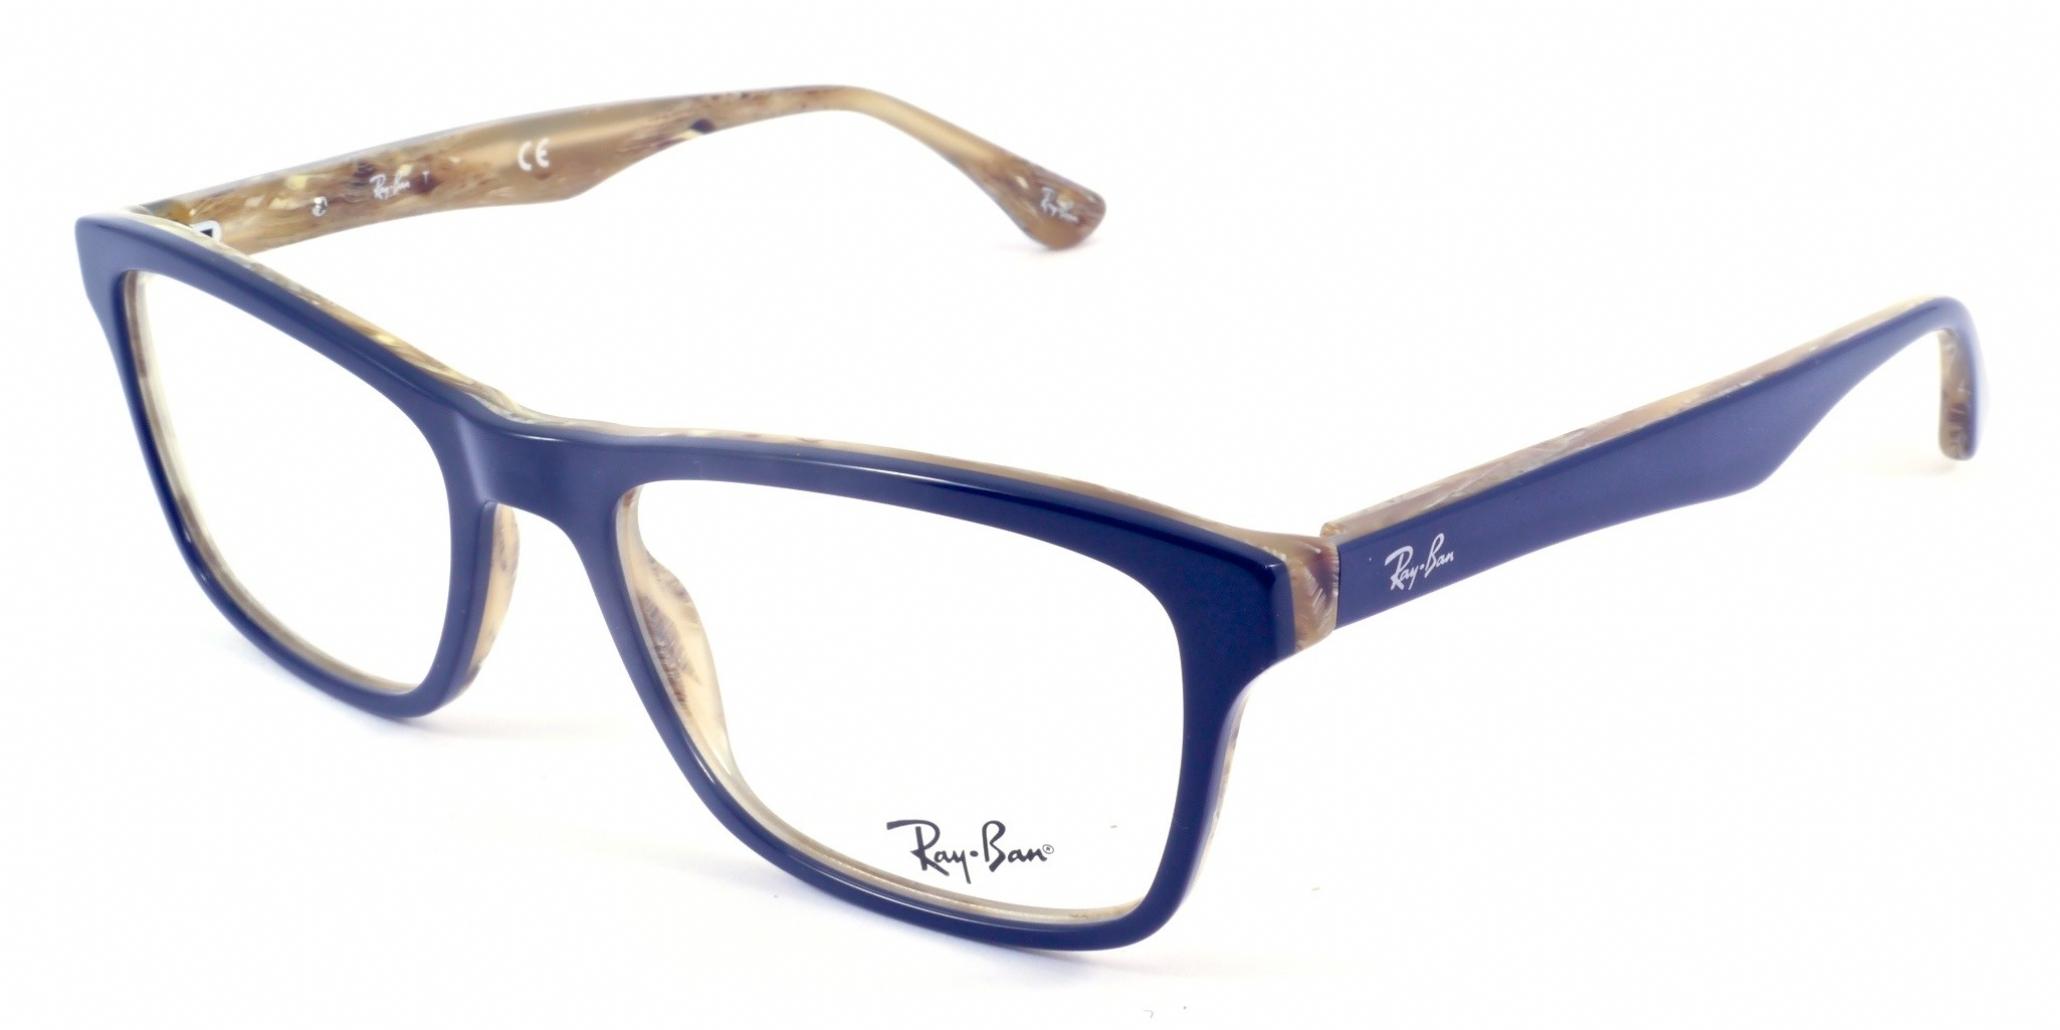 Ray Ban Glasses Frames Rx5279 : Ray Ban 5279 Review